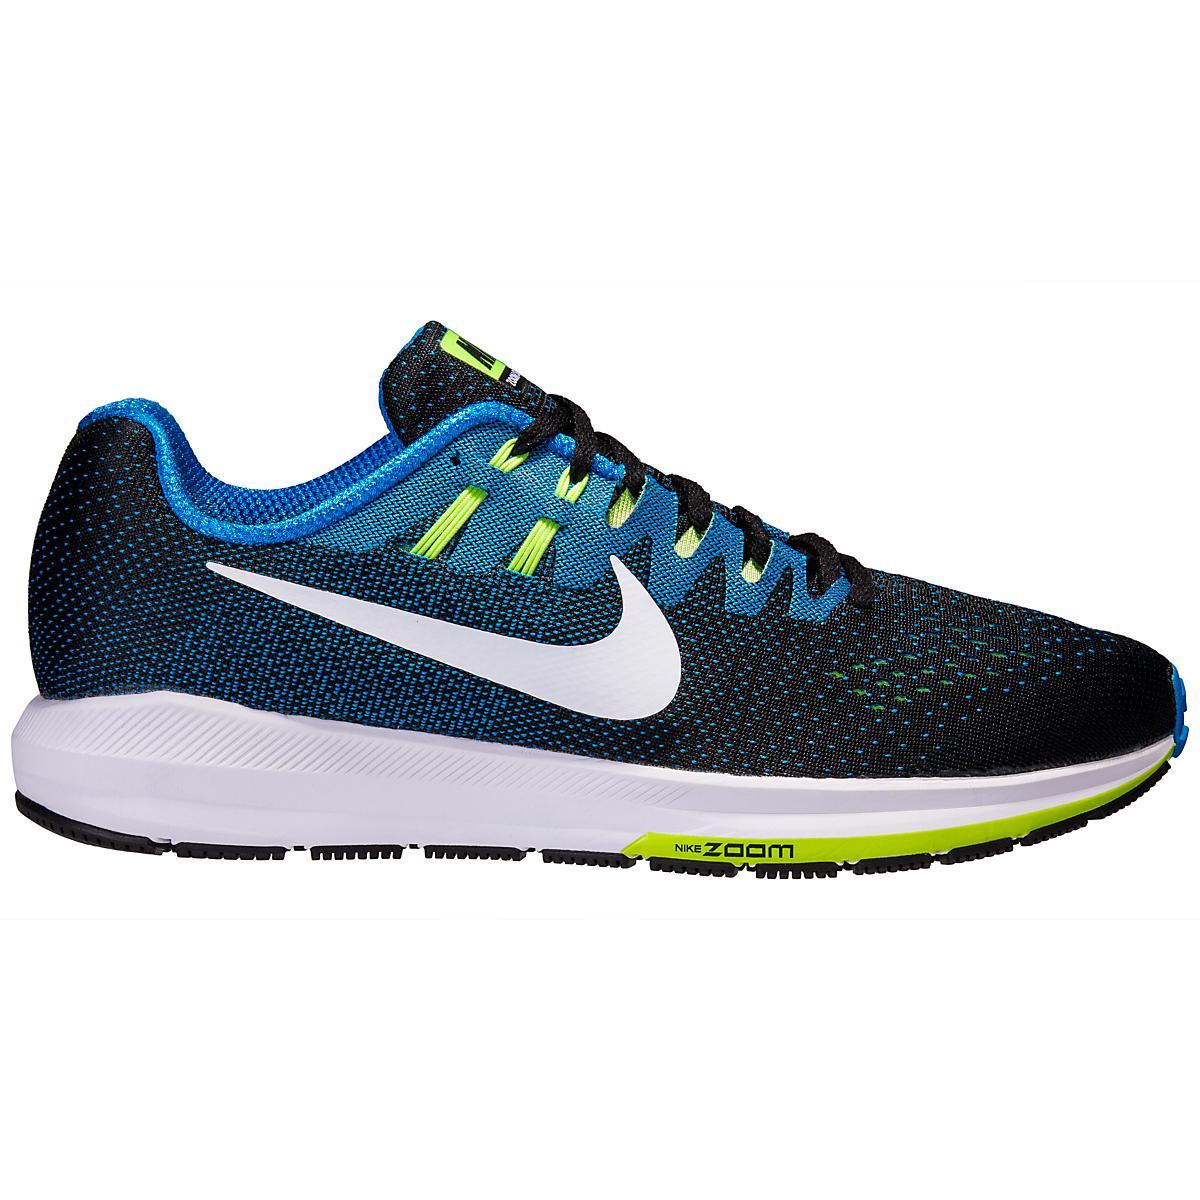 pagar Tamano relativo solamente  Mens Nike Air Zoom Structure 20 Running Shoe at Road Runner Sports